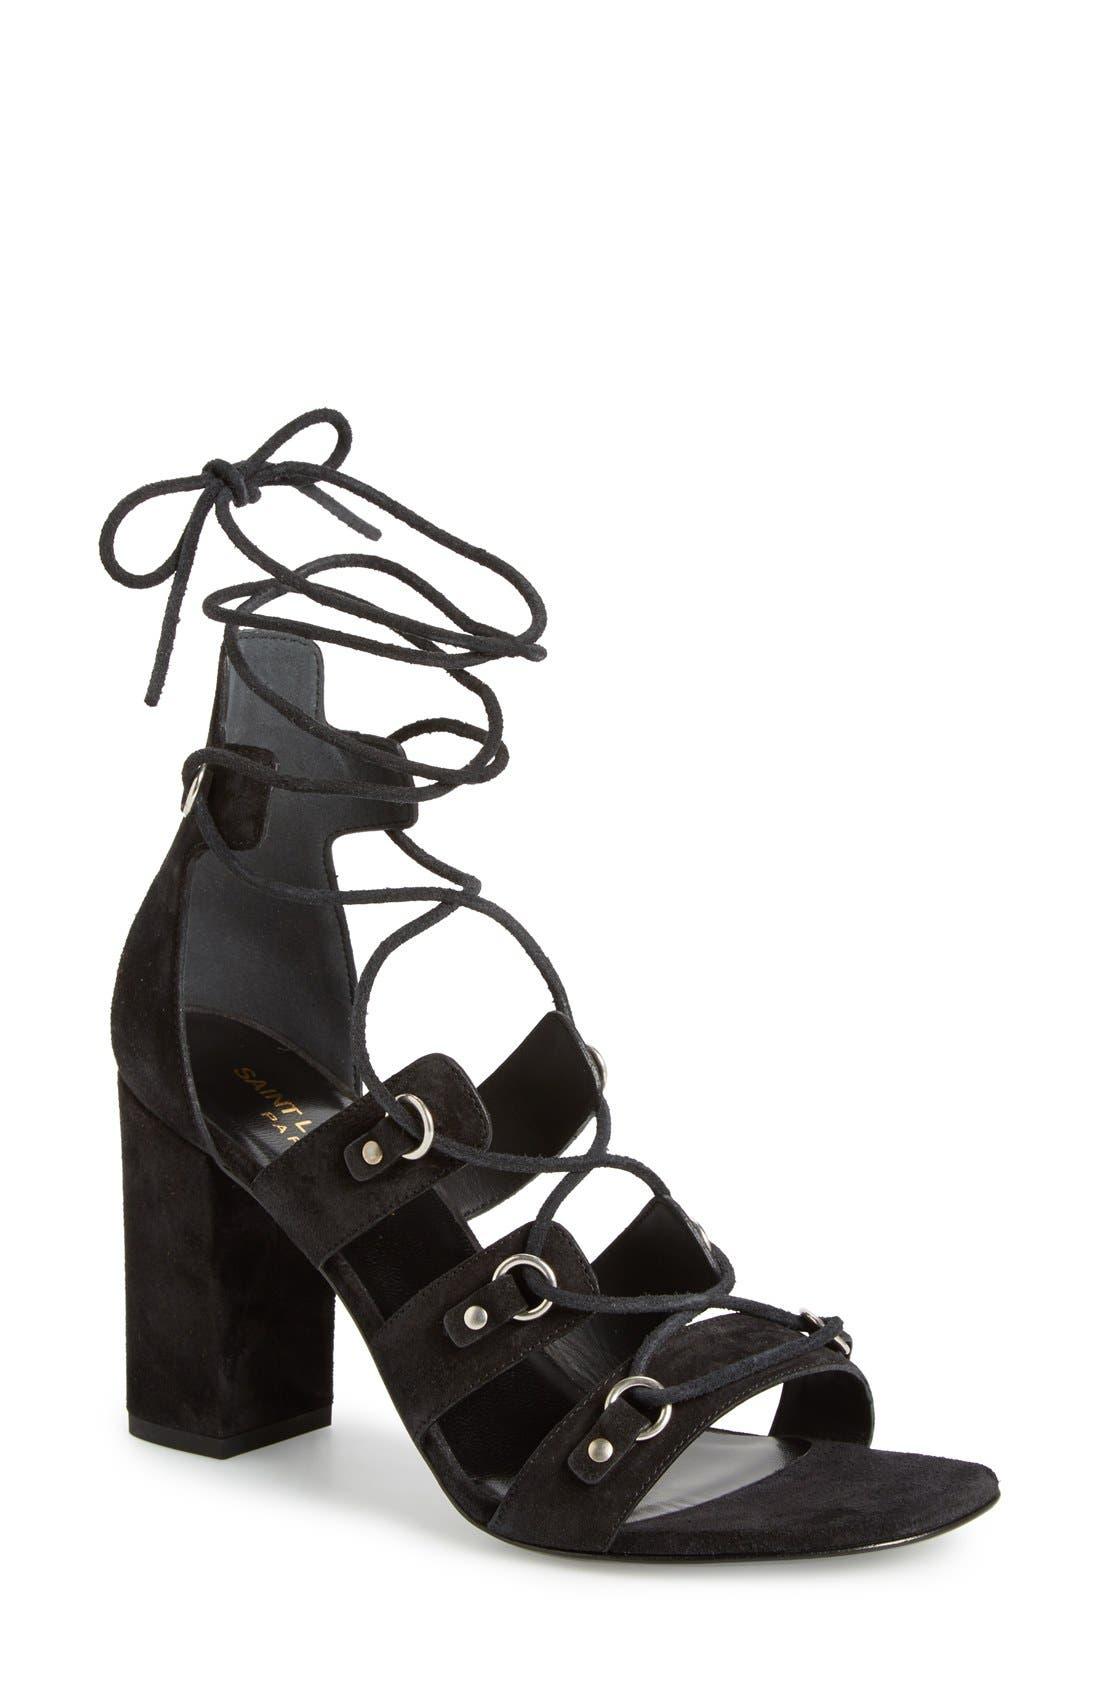 Main Image - Saint Laurent 'Babies Eyelet' Block Heel Ghillie Sandal (Women)